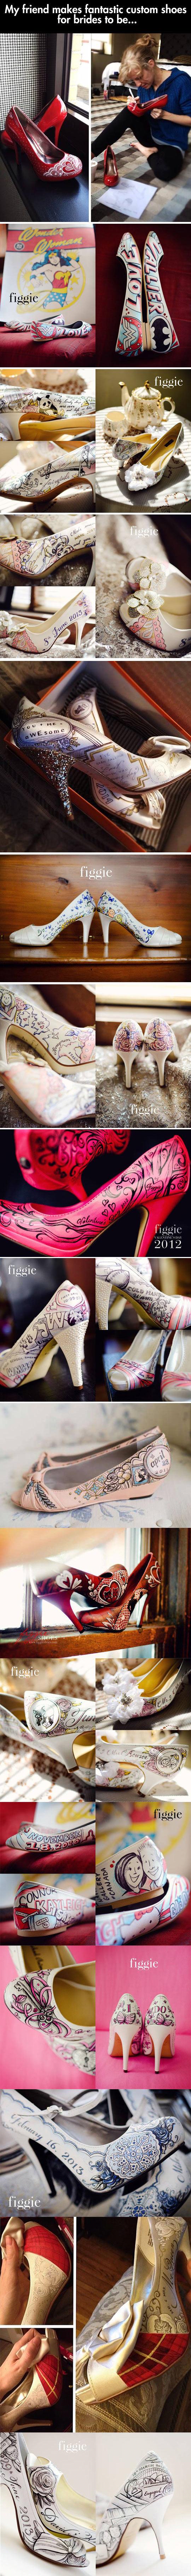 art-customized-shoes-brides-wedding-handpainted